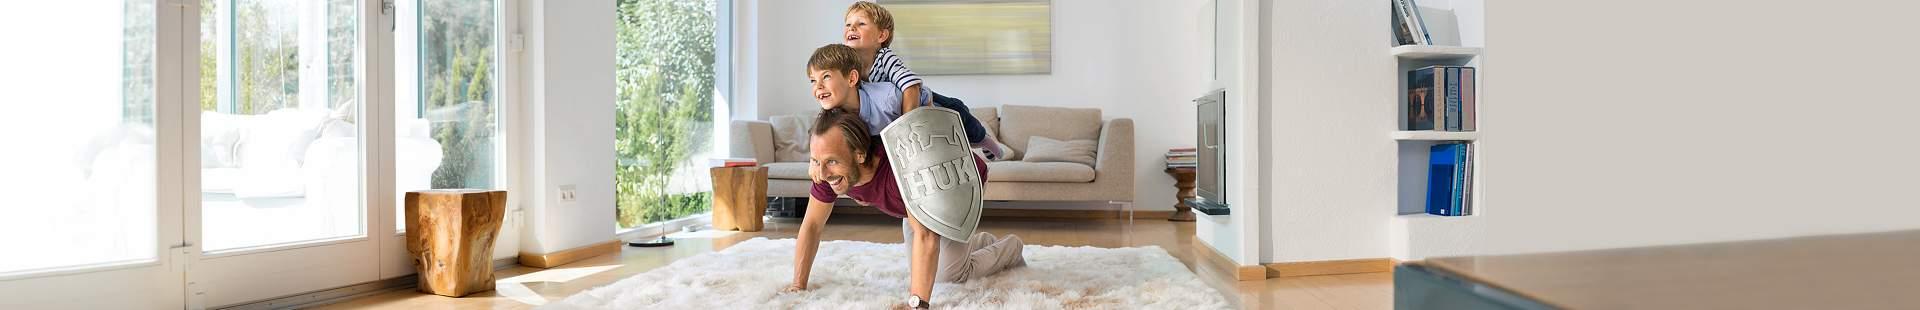 risikolebensversicherung huk coburg. Black Bedroom Furniture Sets. Home Design Ideas